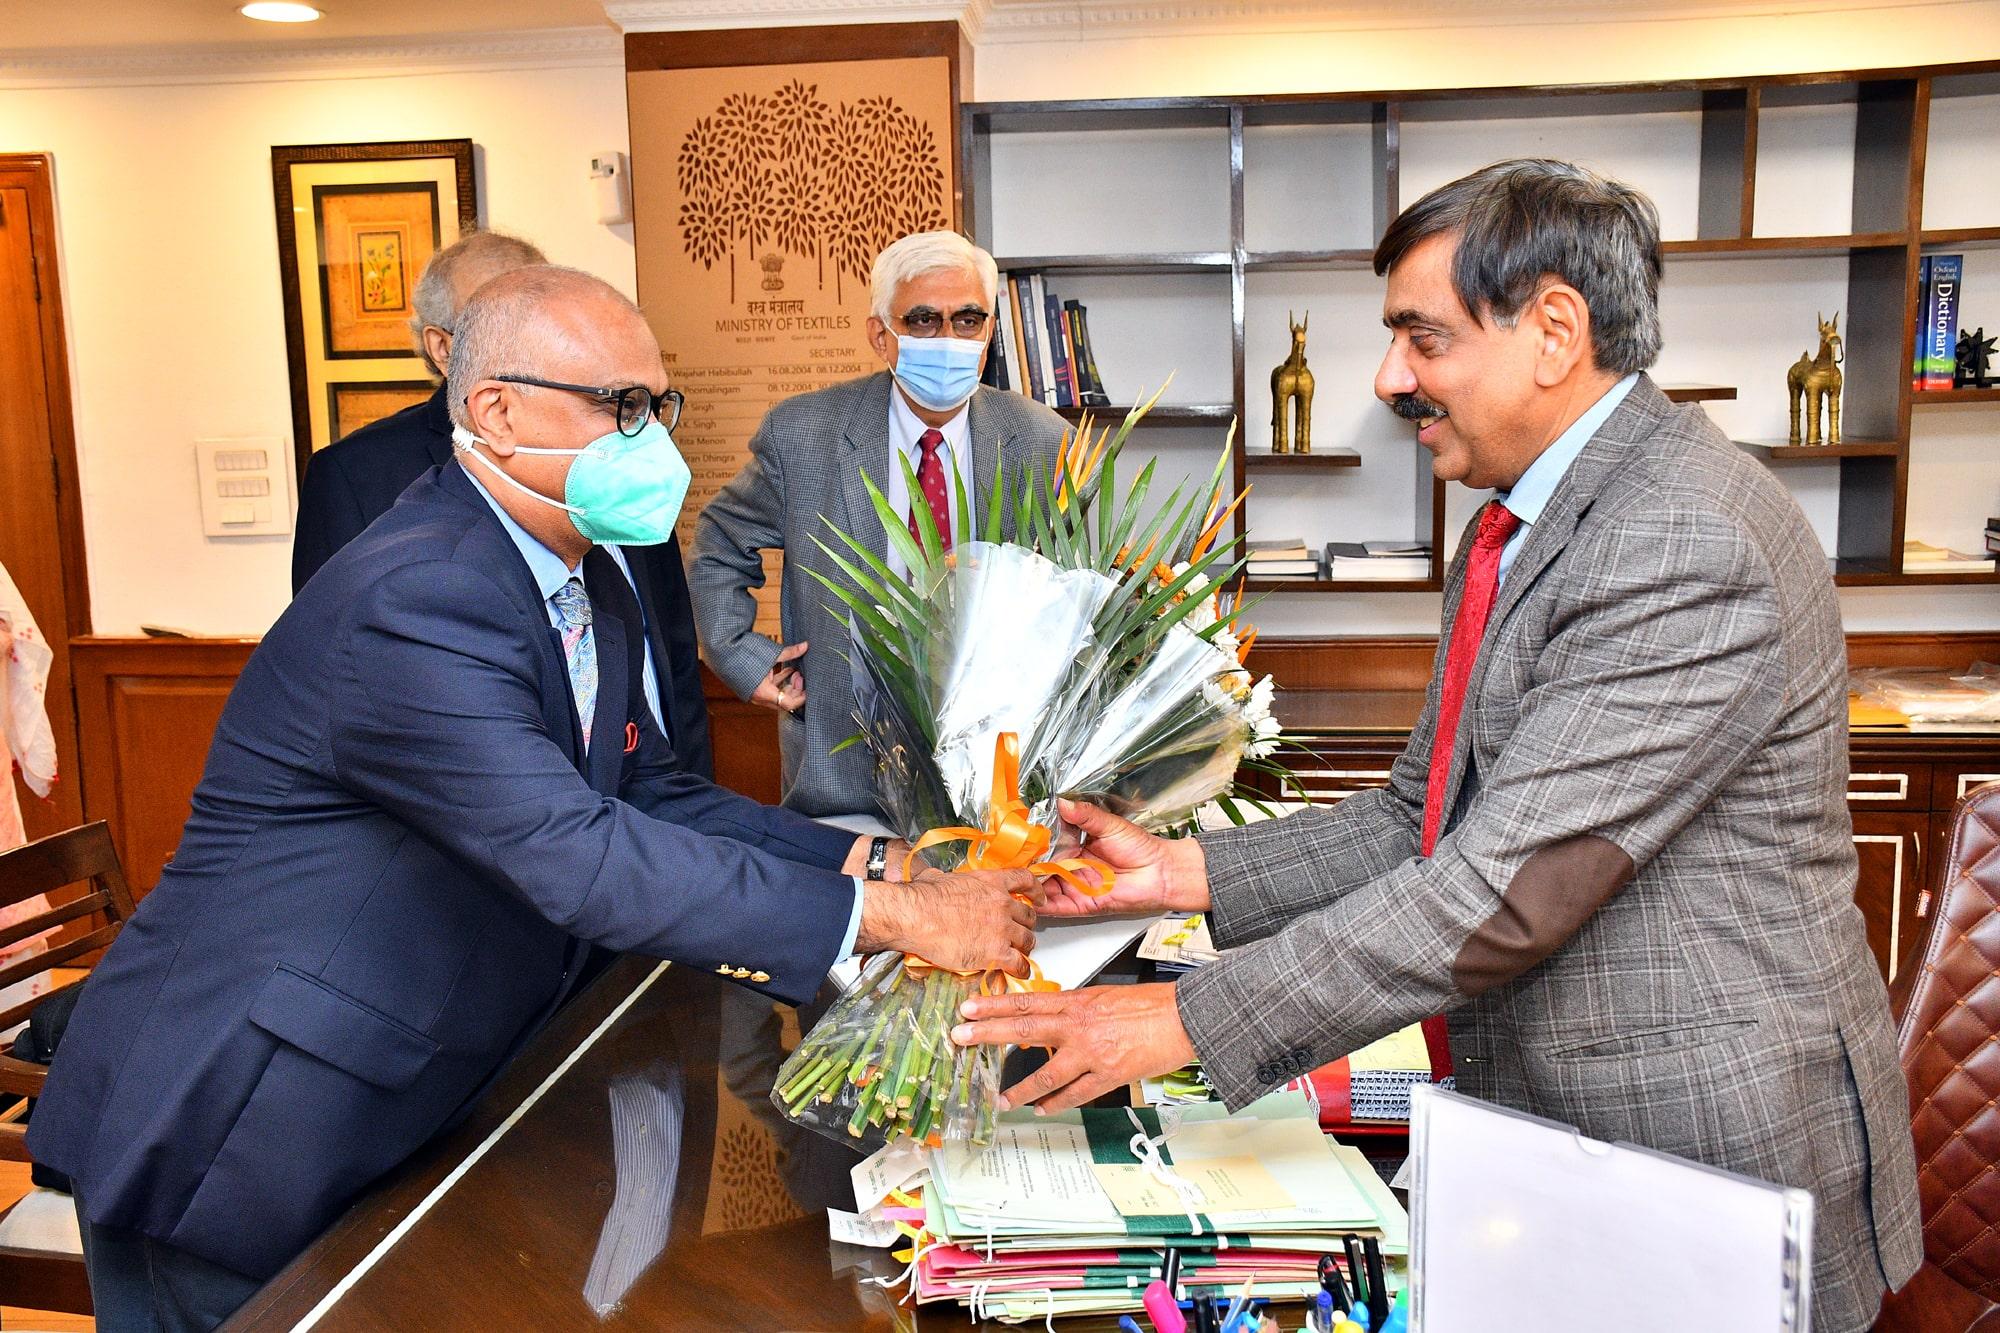 TEXPROCIL Delegation meets Shri Upendra Prasad Singh, Secretary, Textiles at his office in New Delhi on Feb 9, 2021